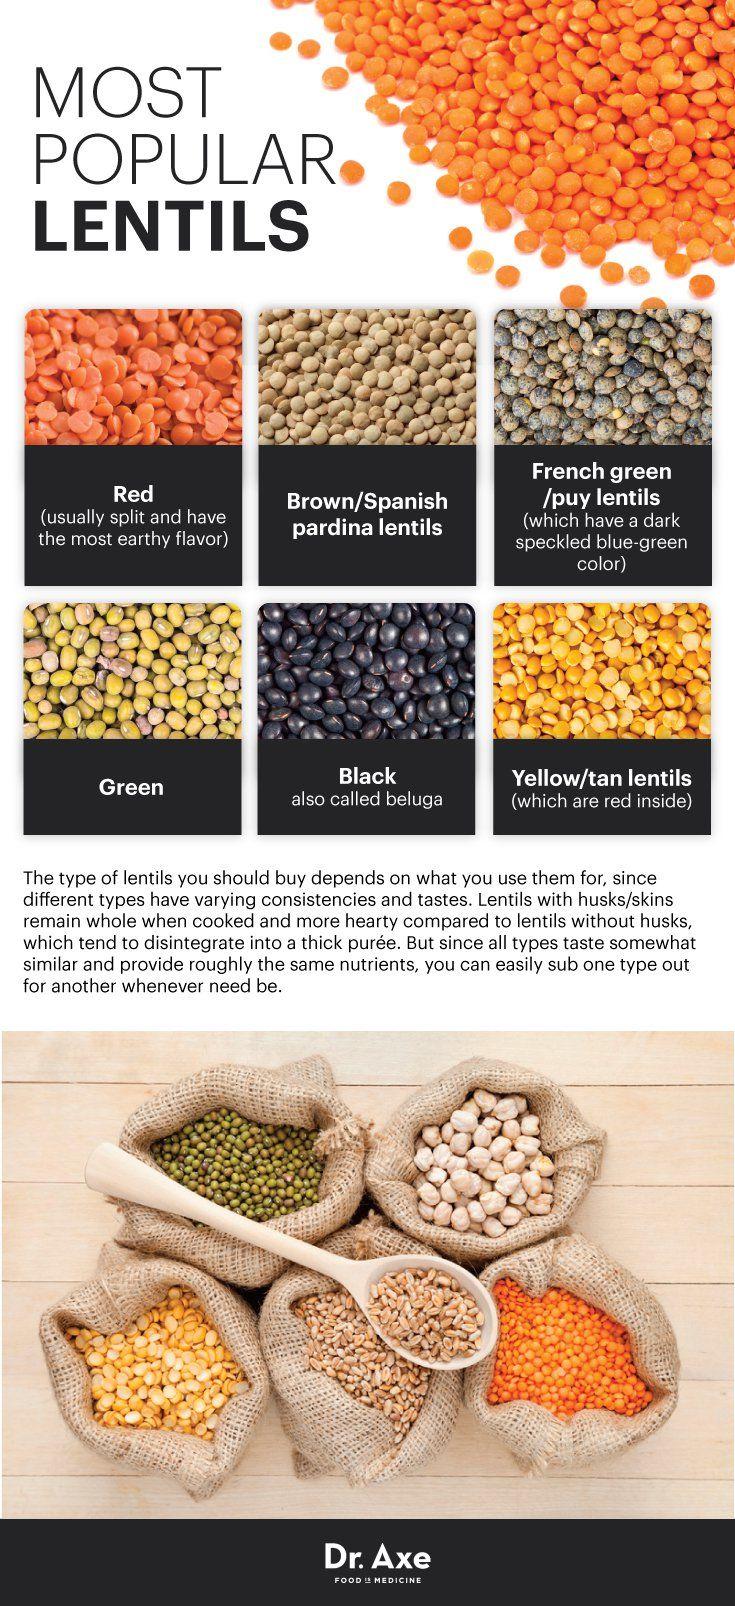 Most popular lentils - Dr. Axe